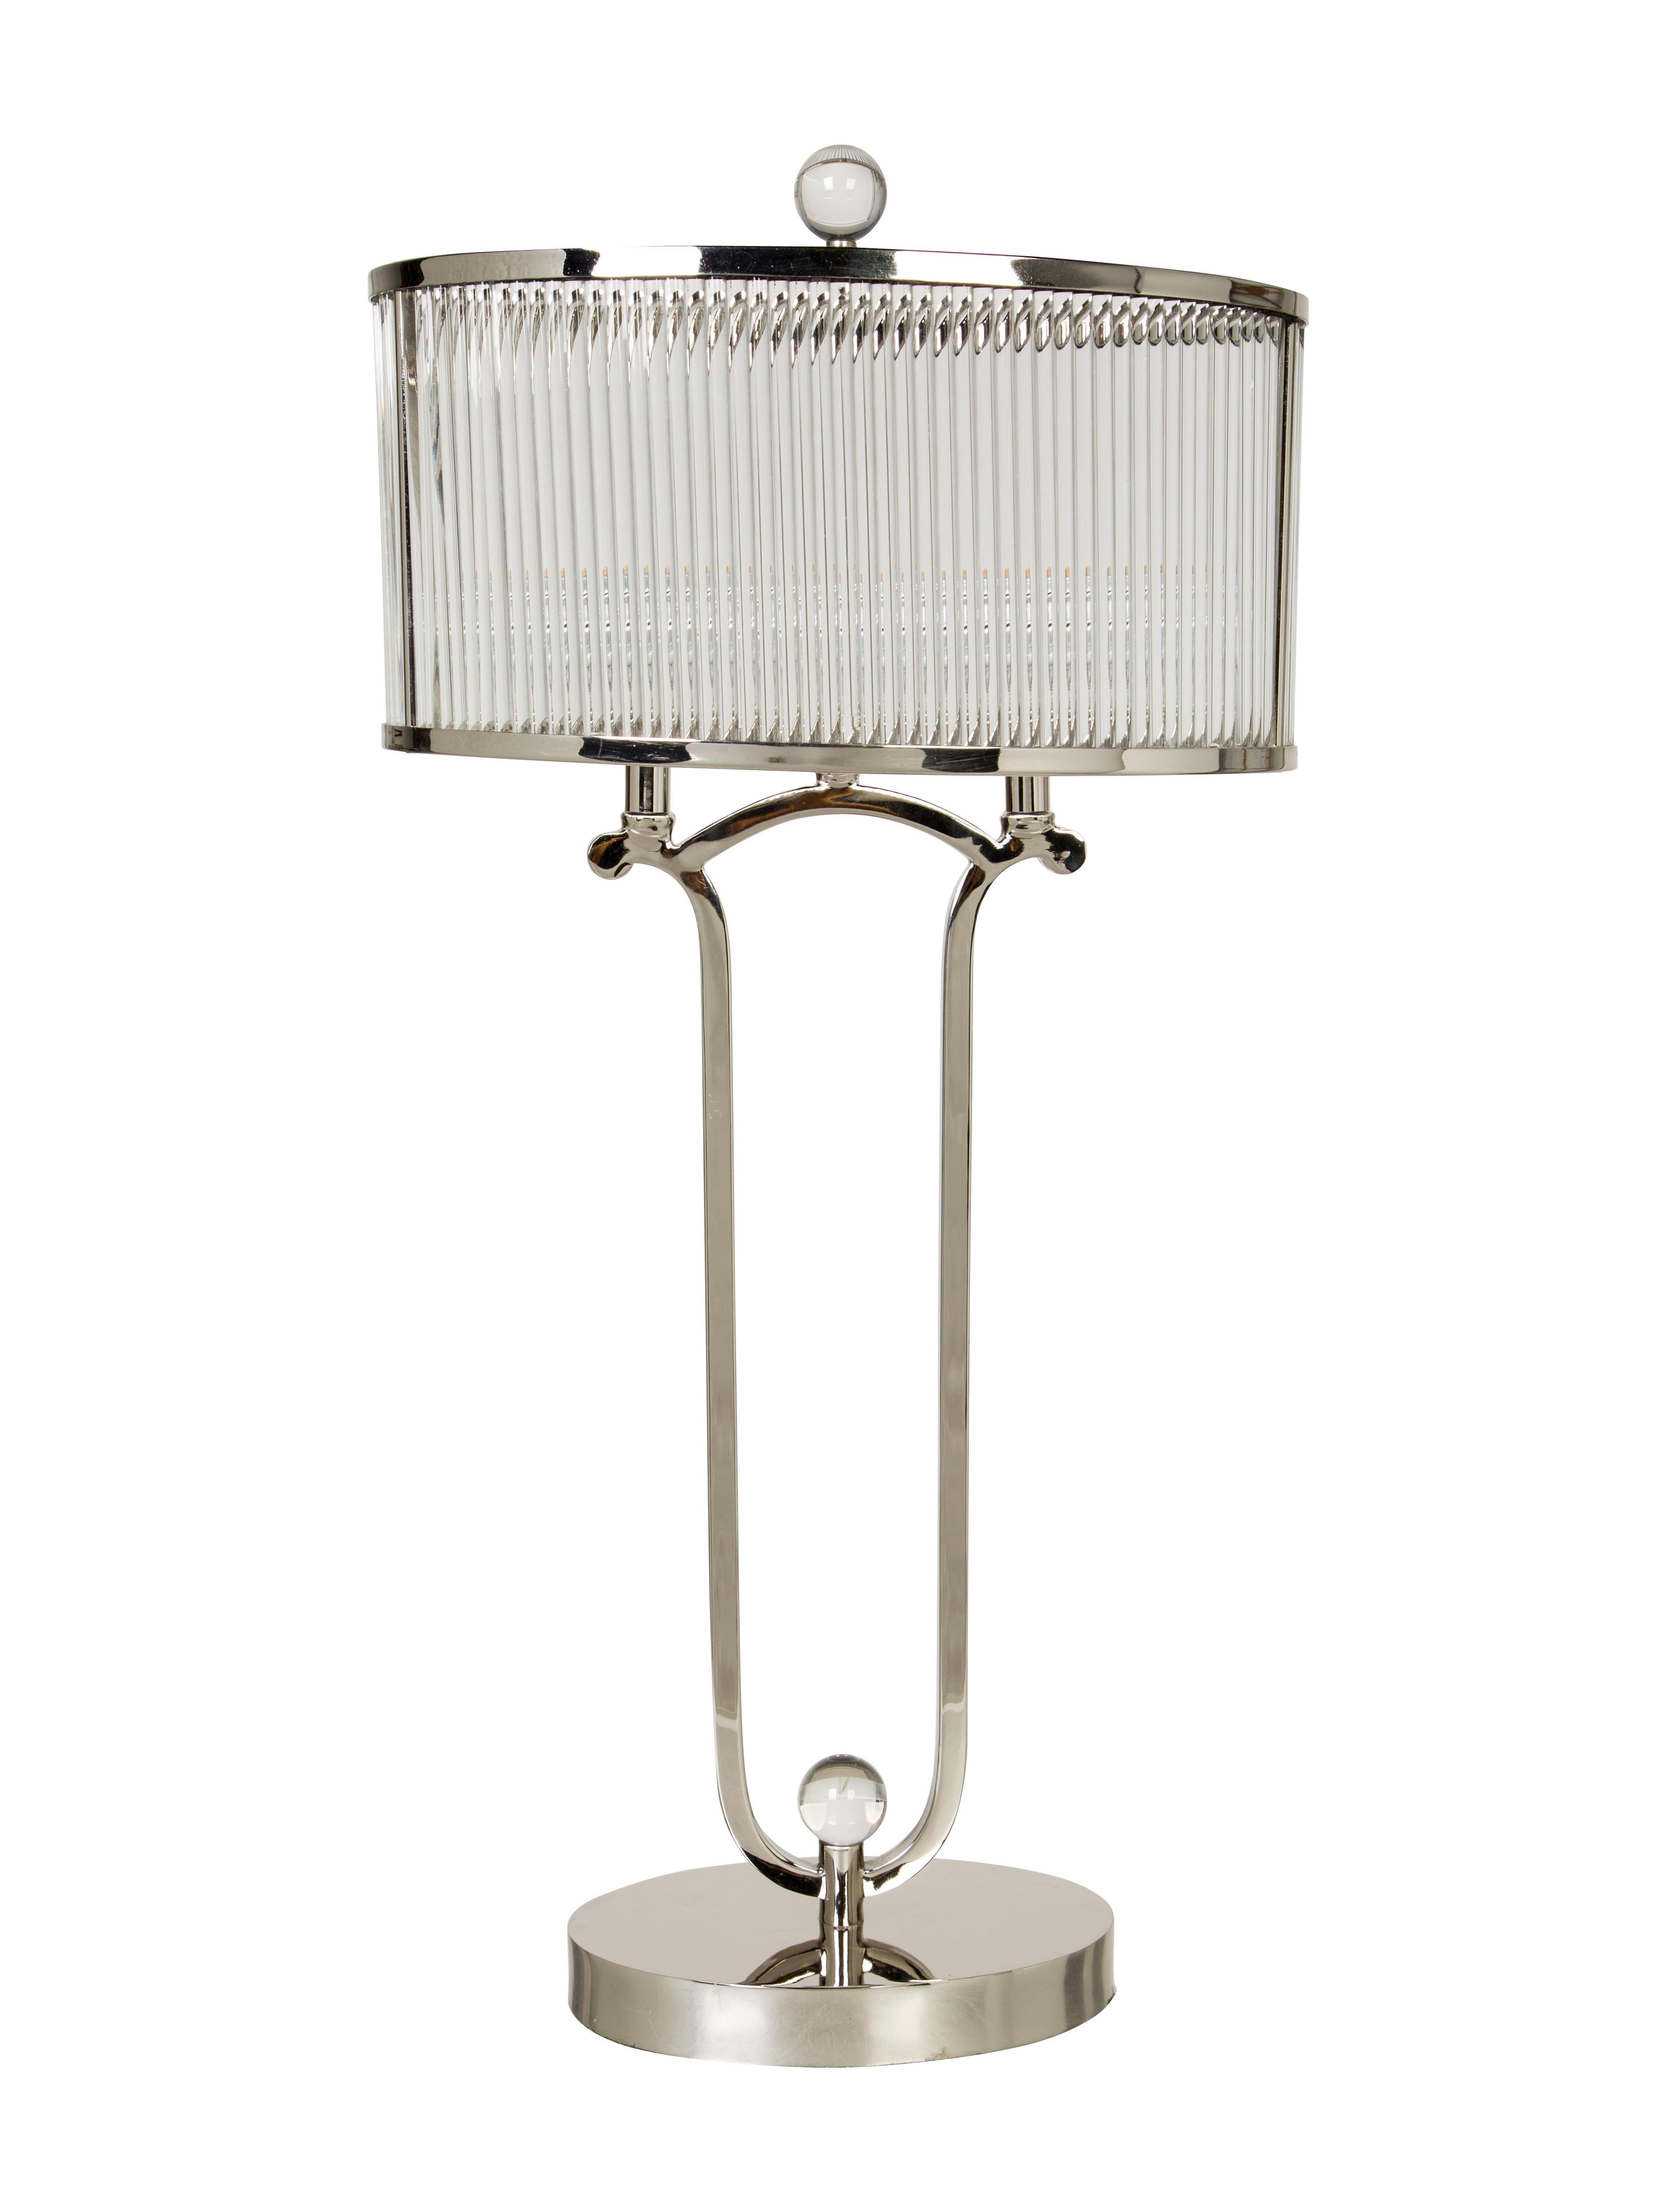 John richard glass table lamp lighting lghti20176 the realreal john richard glass table lamp geotapseo Image collections